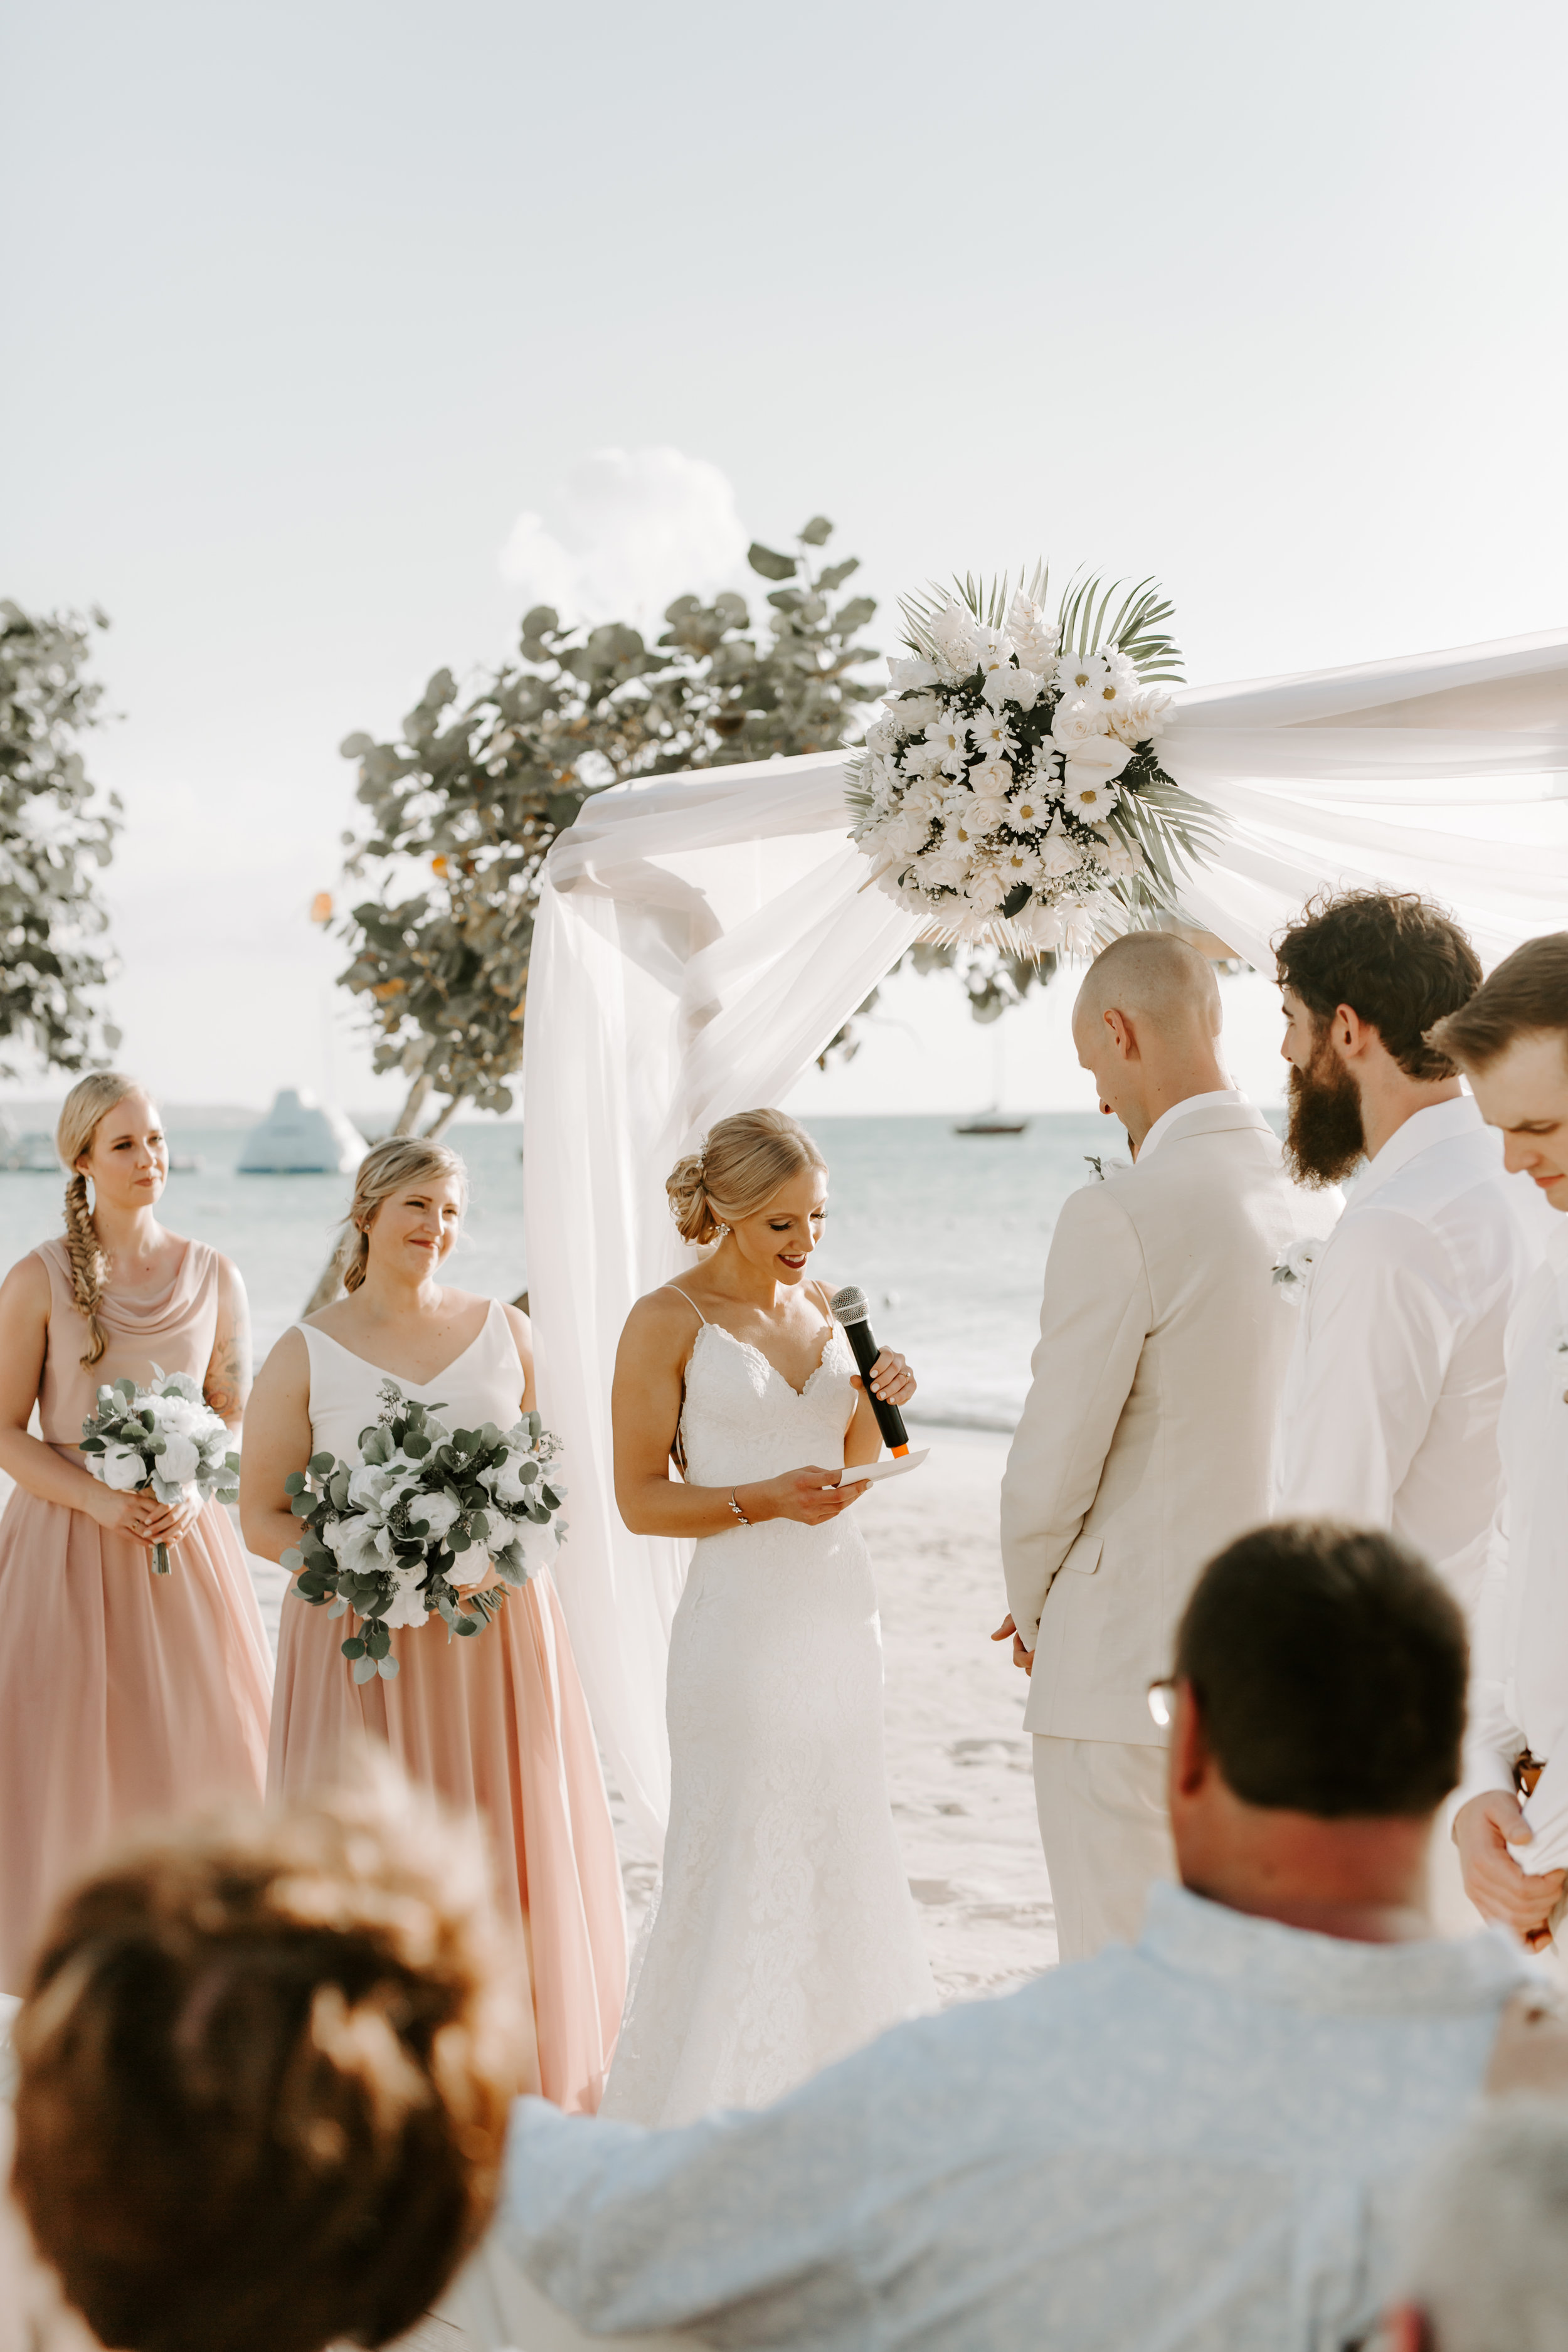 beach wedding, beach wedding dress, wedding vows, wedding day, destination wedding, jamaica wedding, define fettle